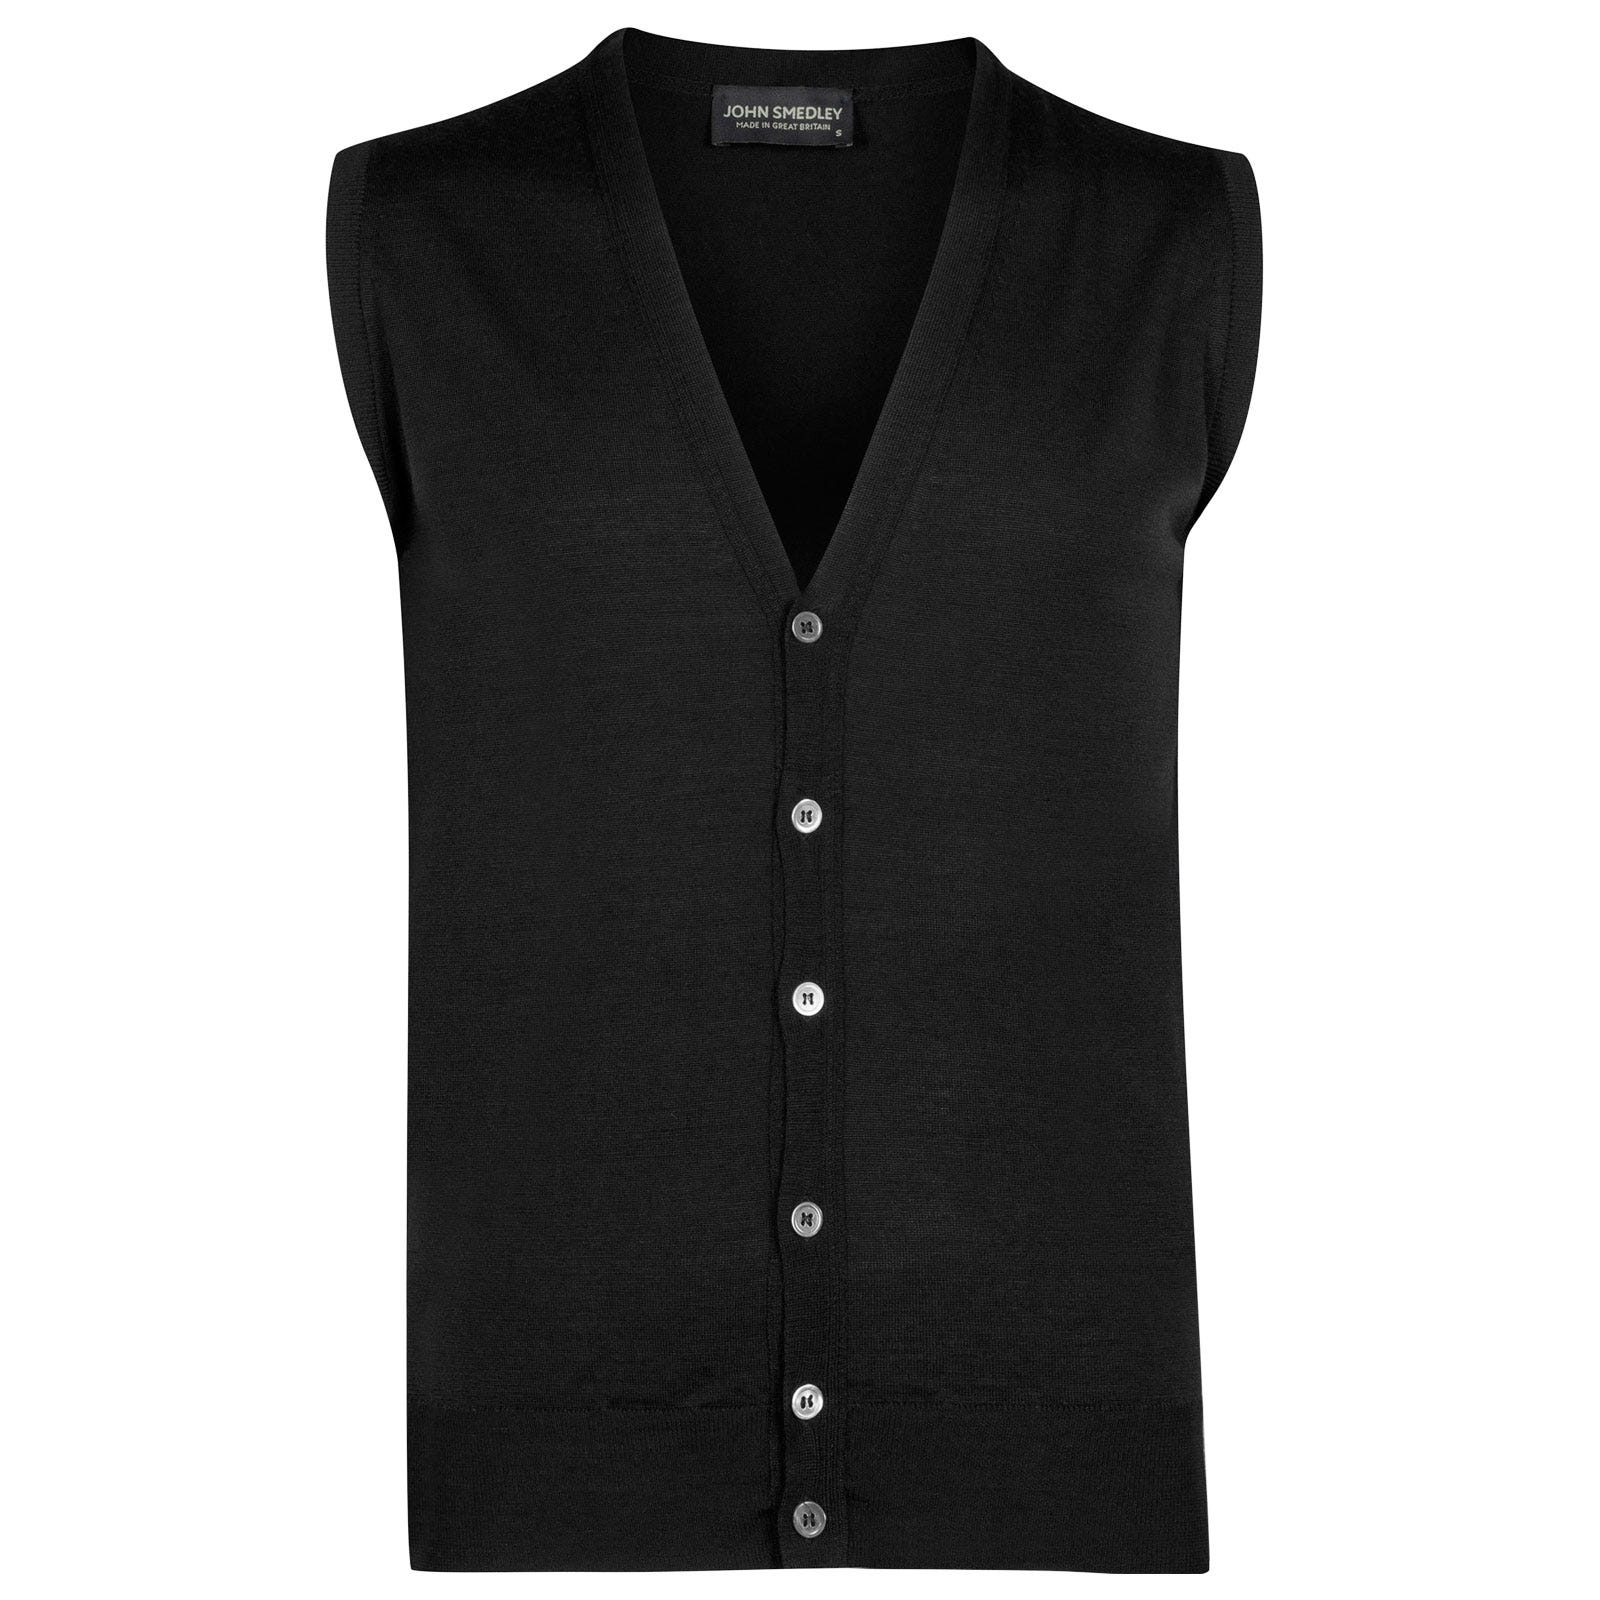 John Smedley huntswood Merino Wool Waistcoat in Black-S